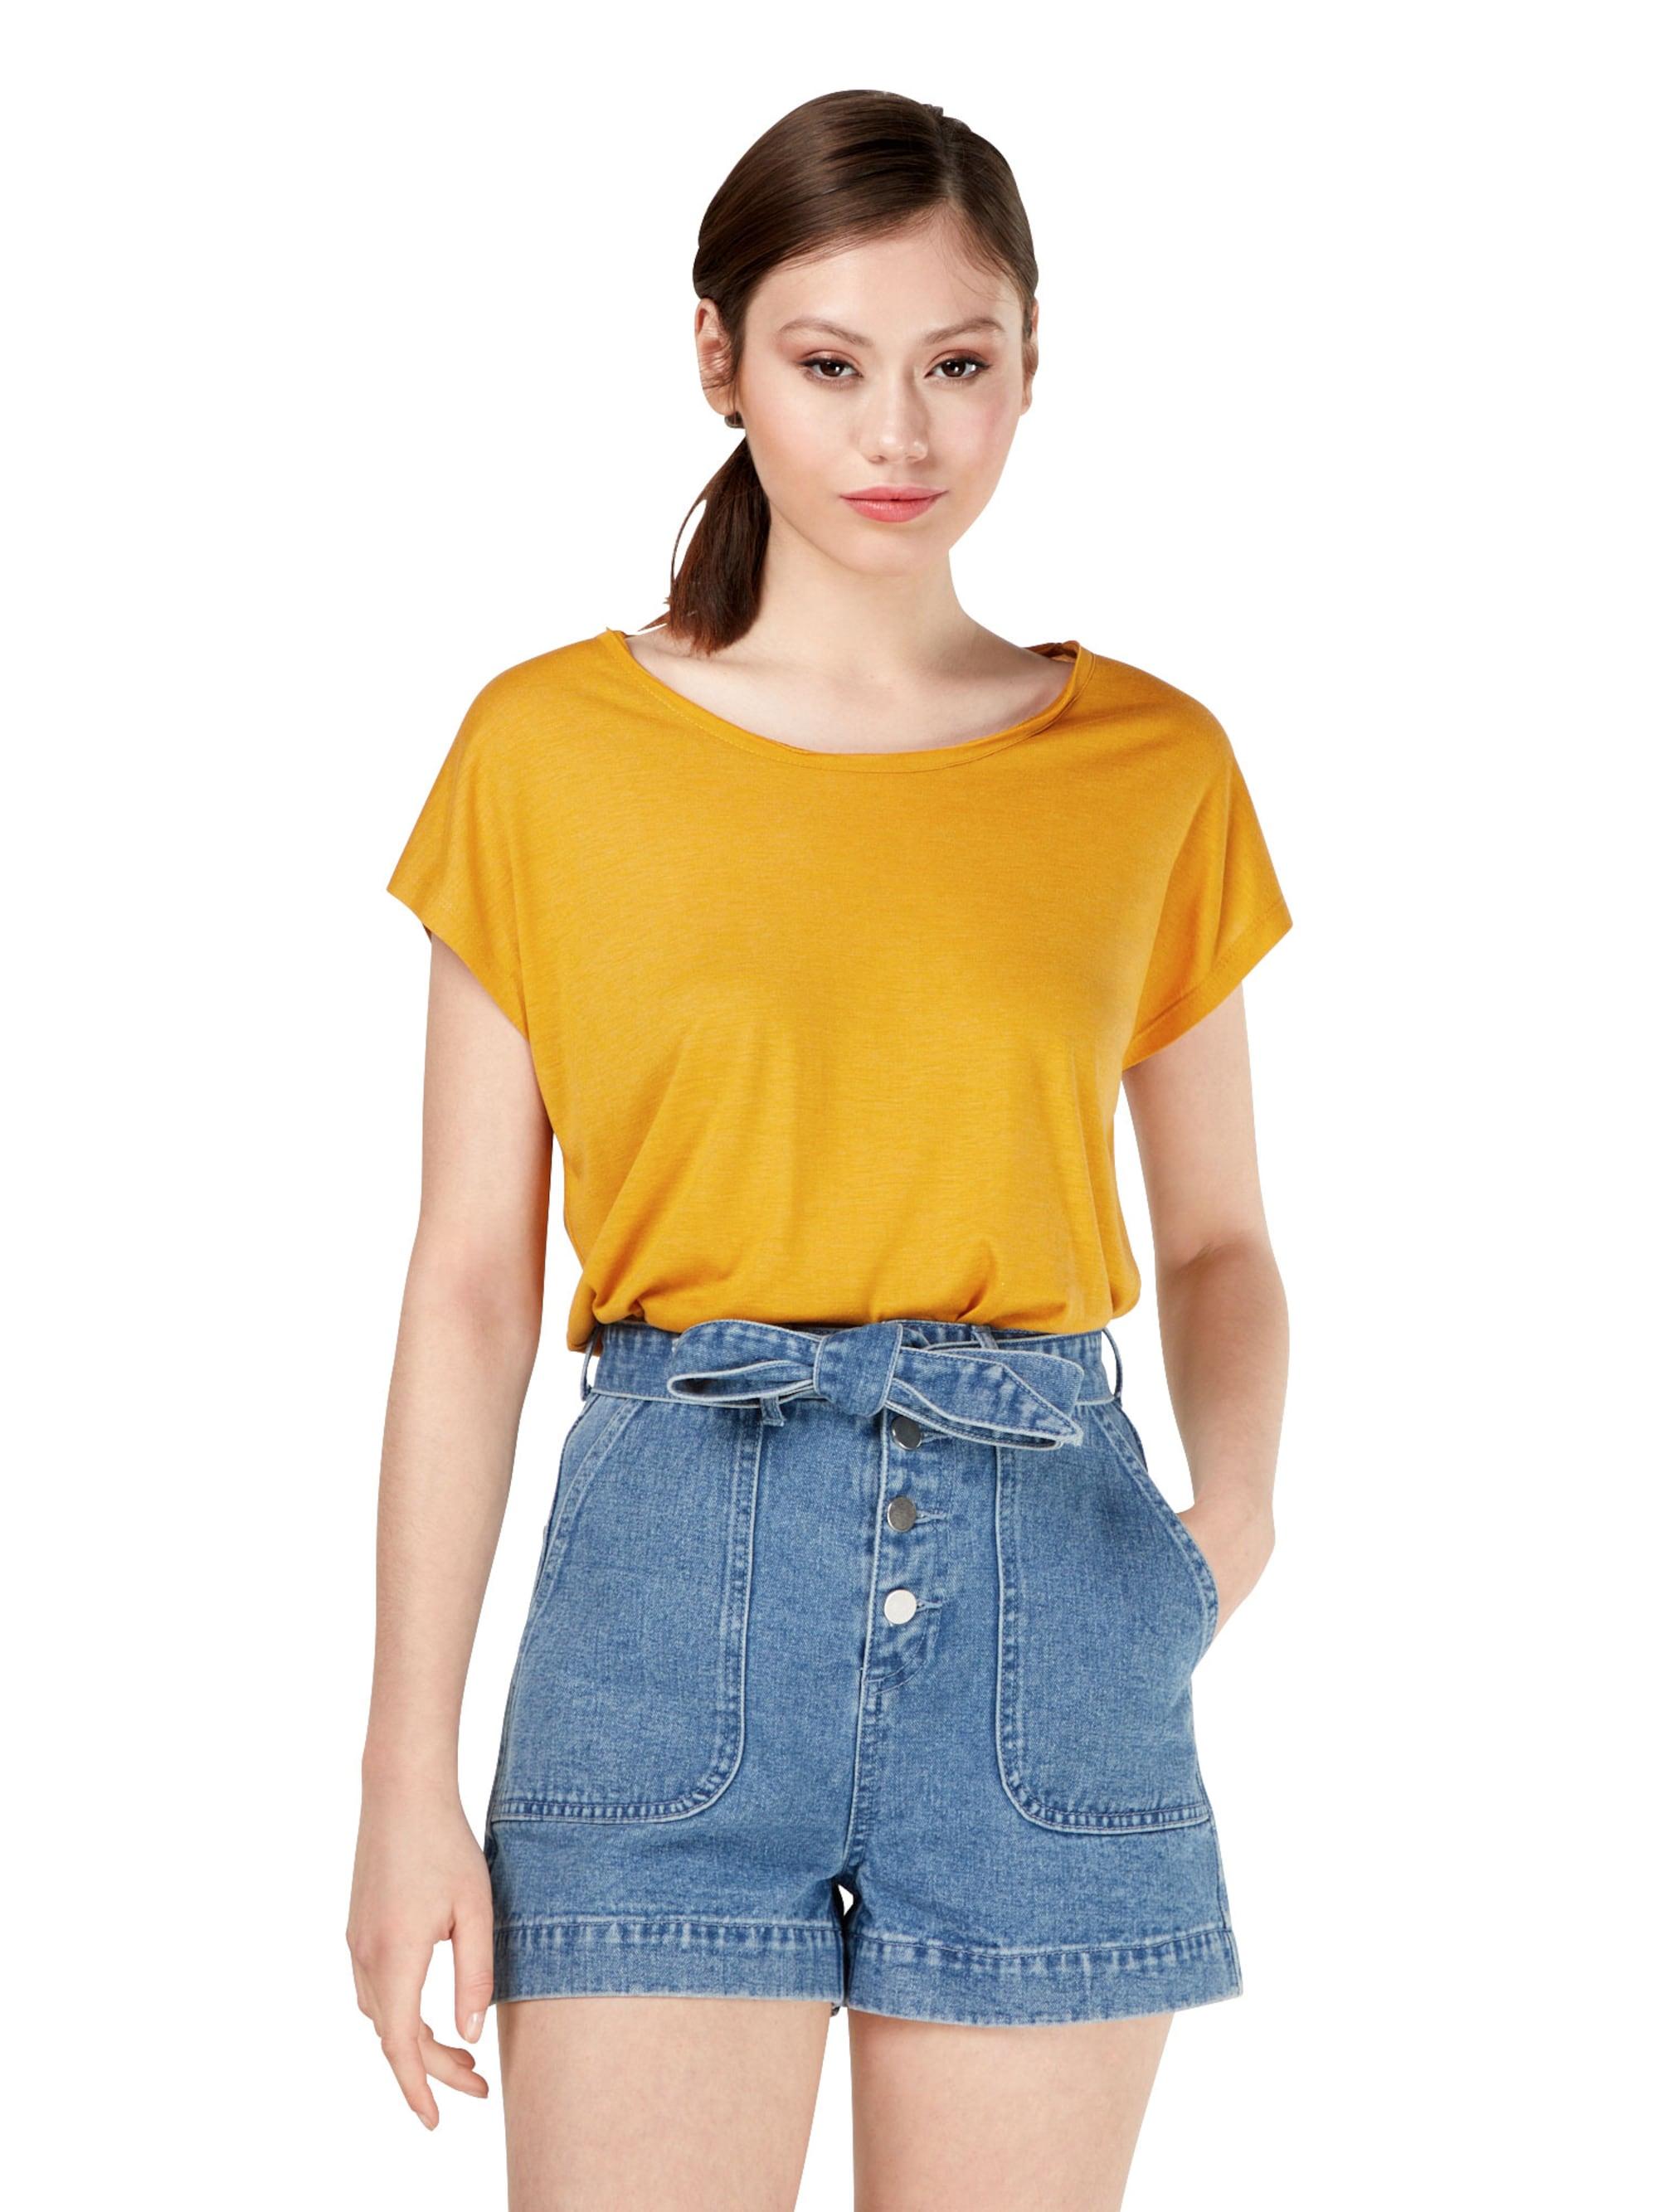 Tigha Koszulka 'Effi'  złoty żółty